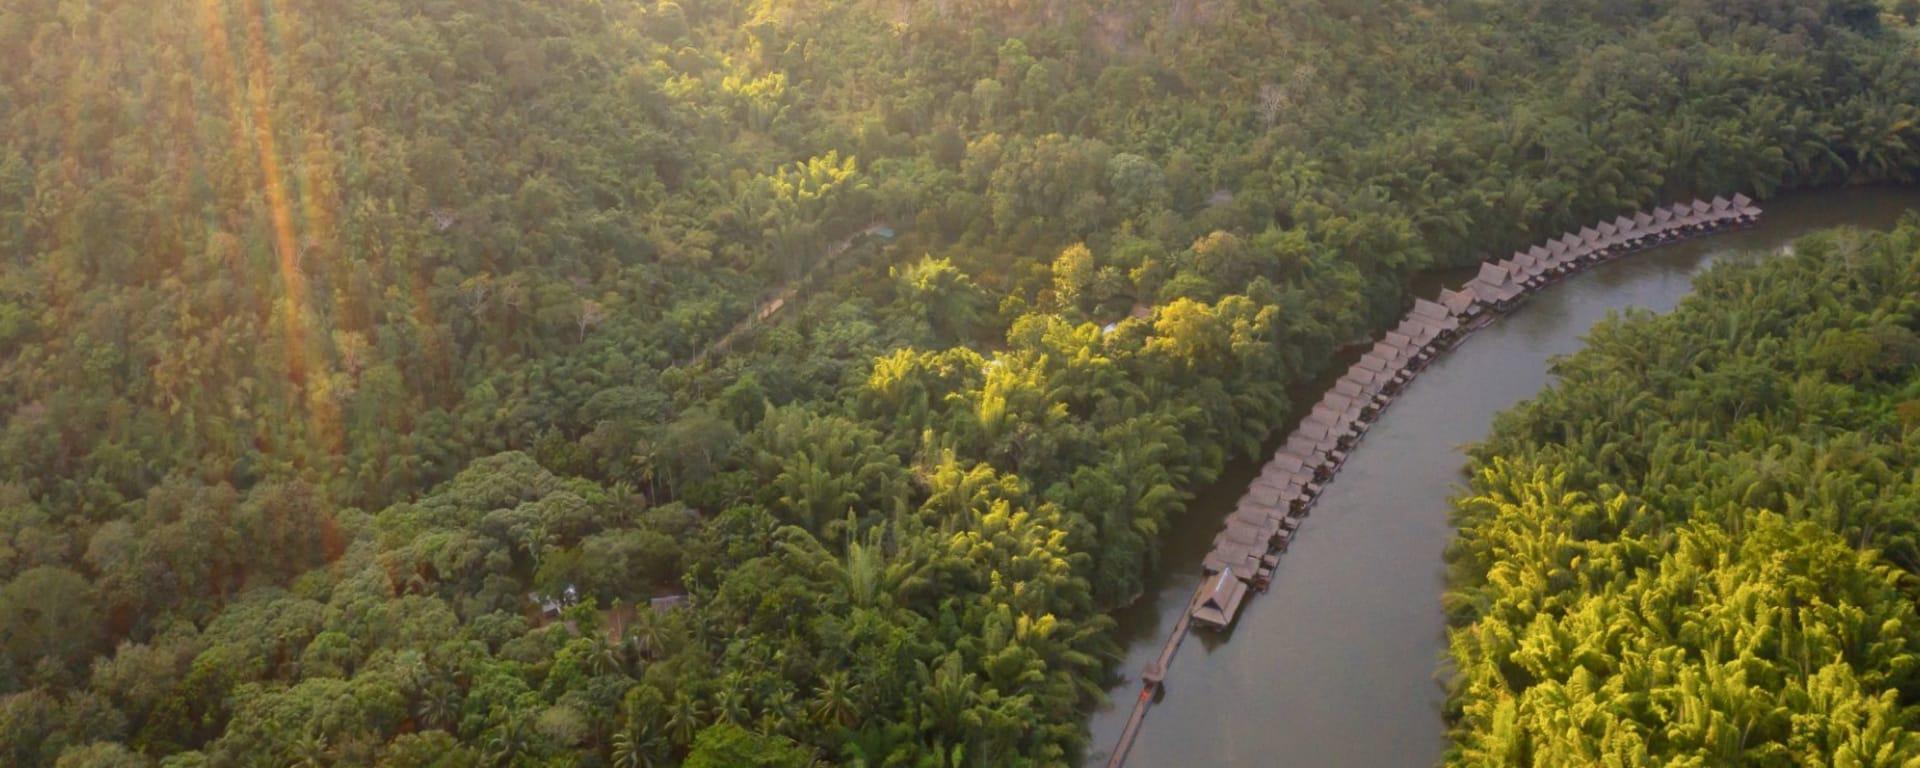 River Kwai Soft Adventure ab Bangkok: location: aerial view